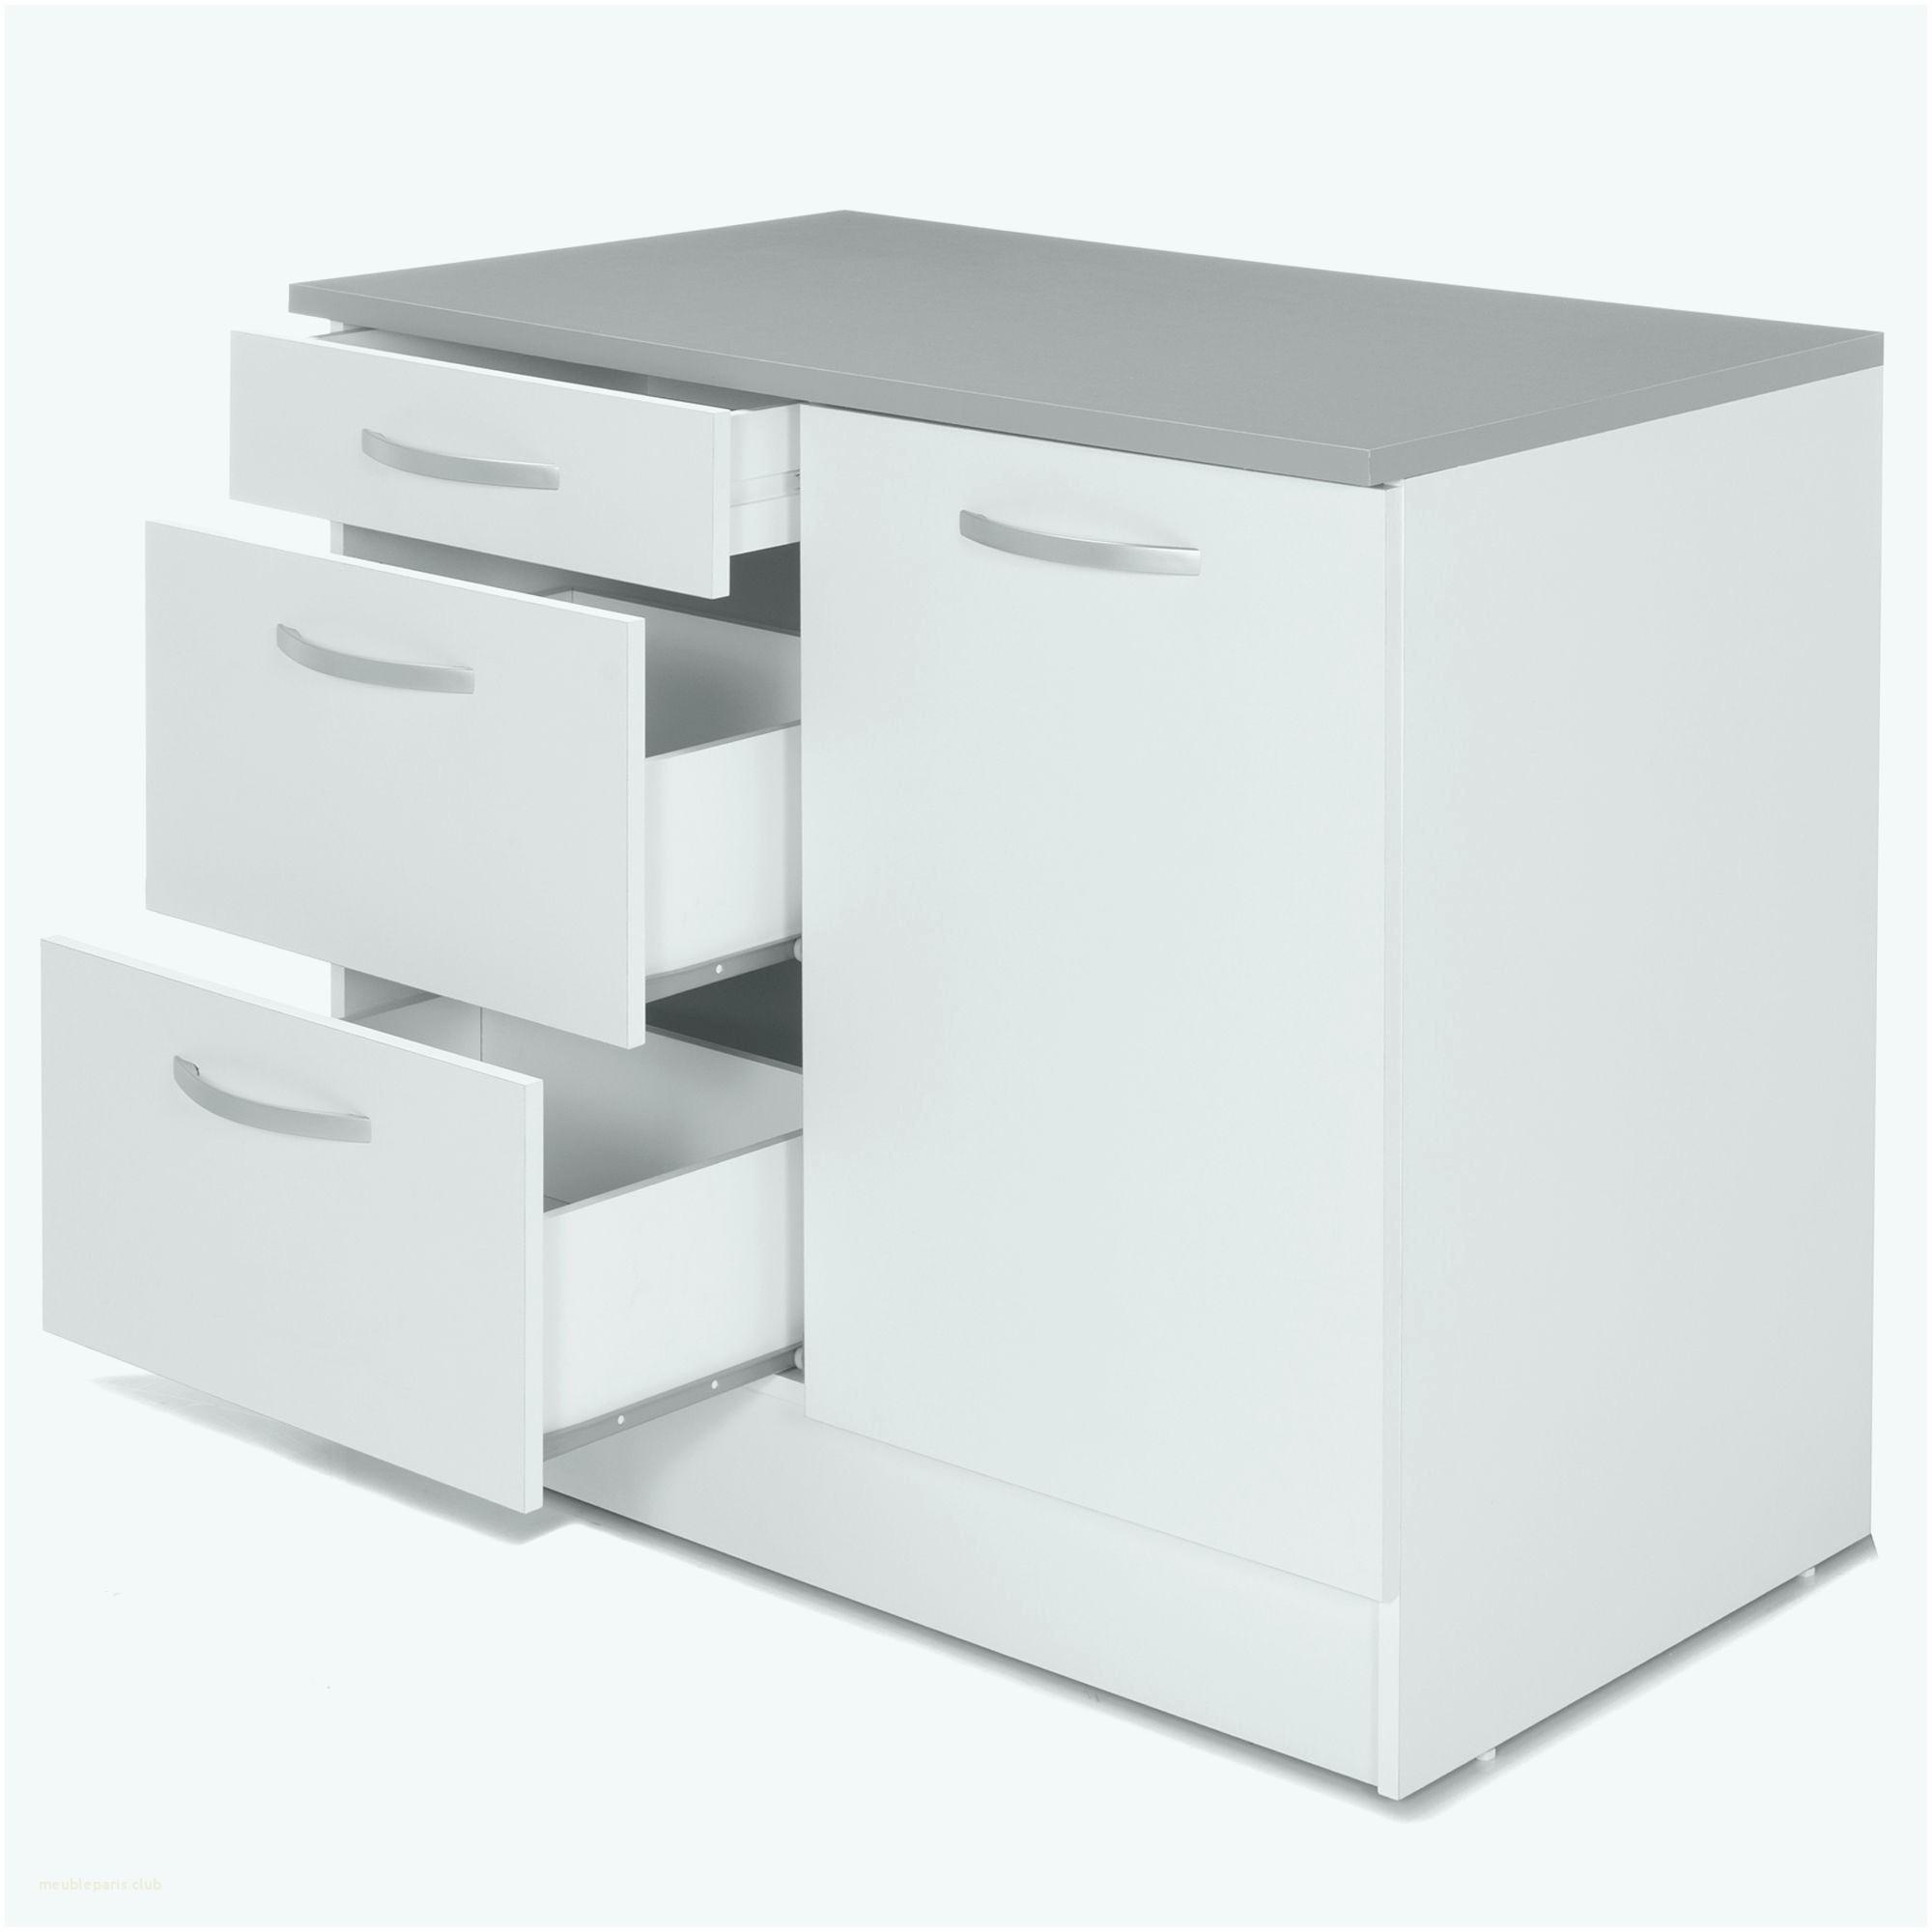 meuble console i i meuble rangement table de chevet scandinave i meuble console of meuble console i